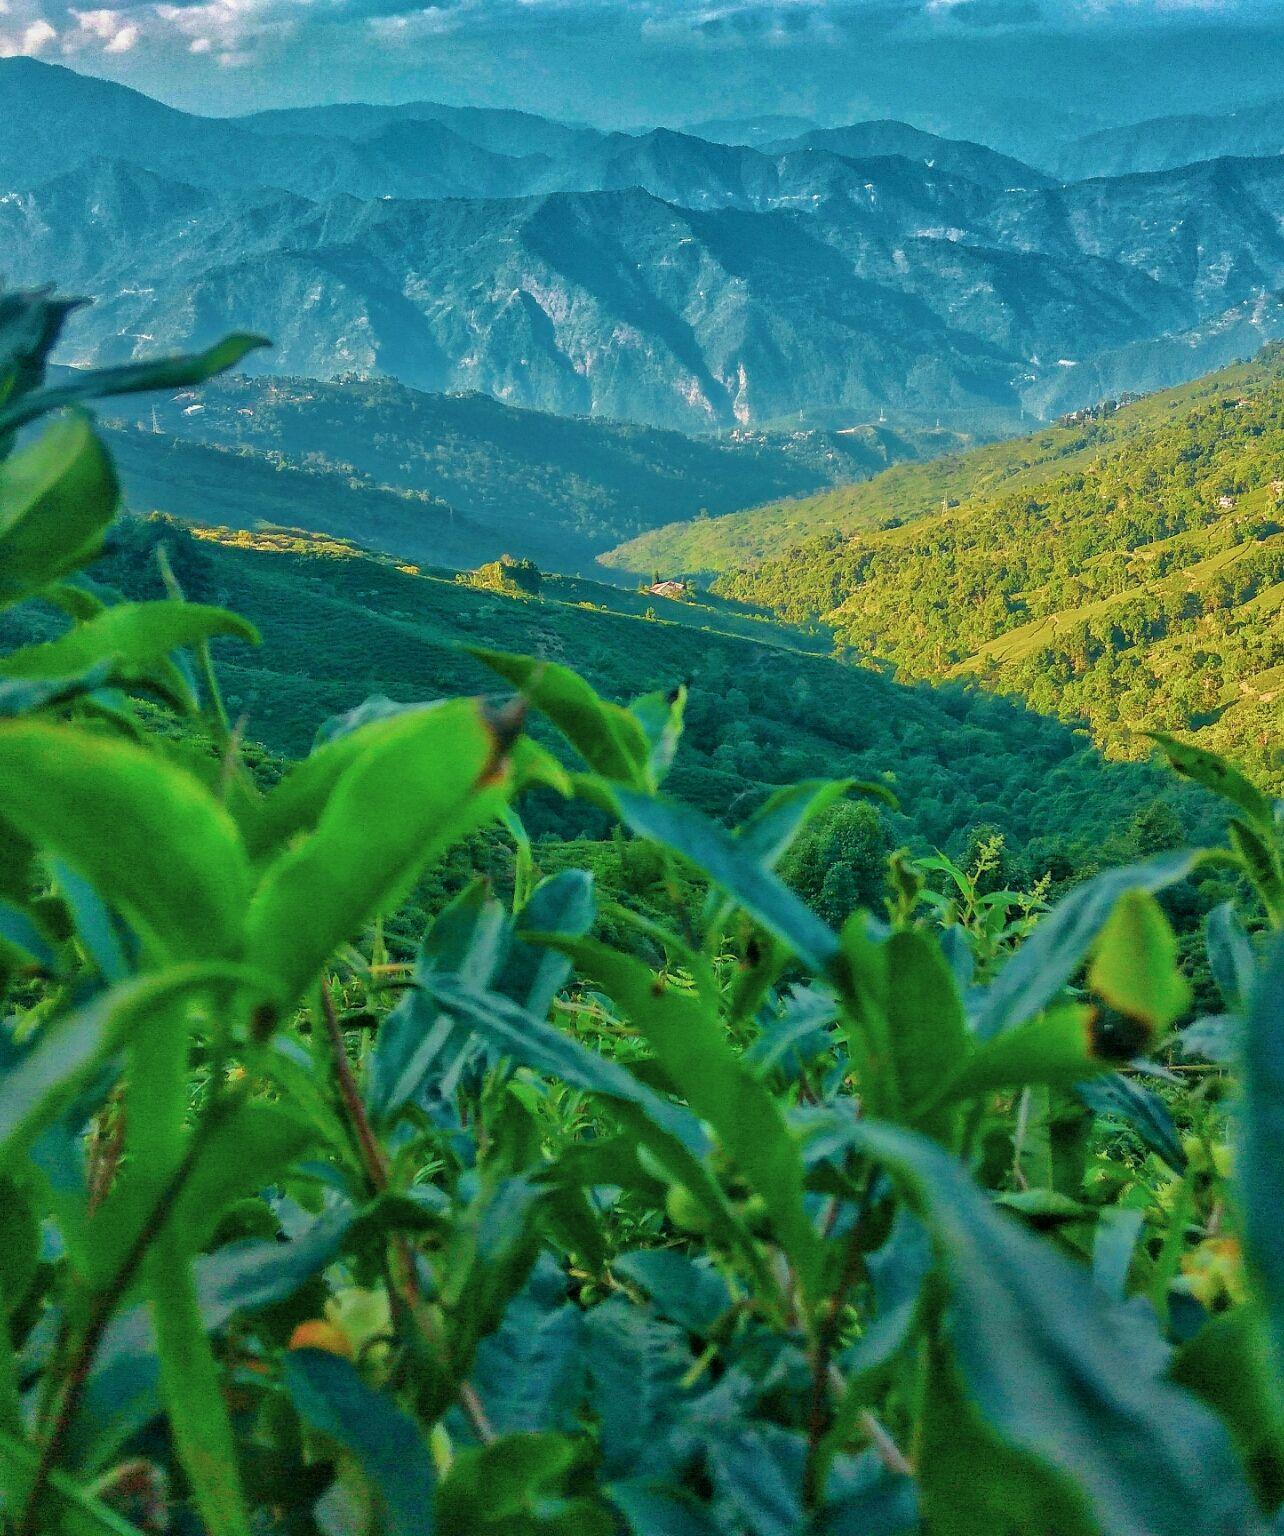 Photo of Darjeeling By Abhinav Dev